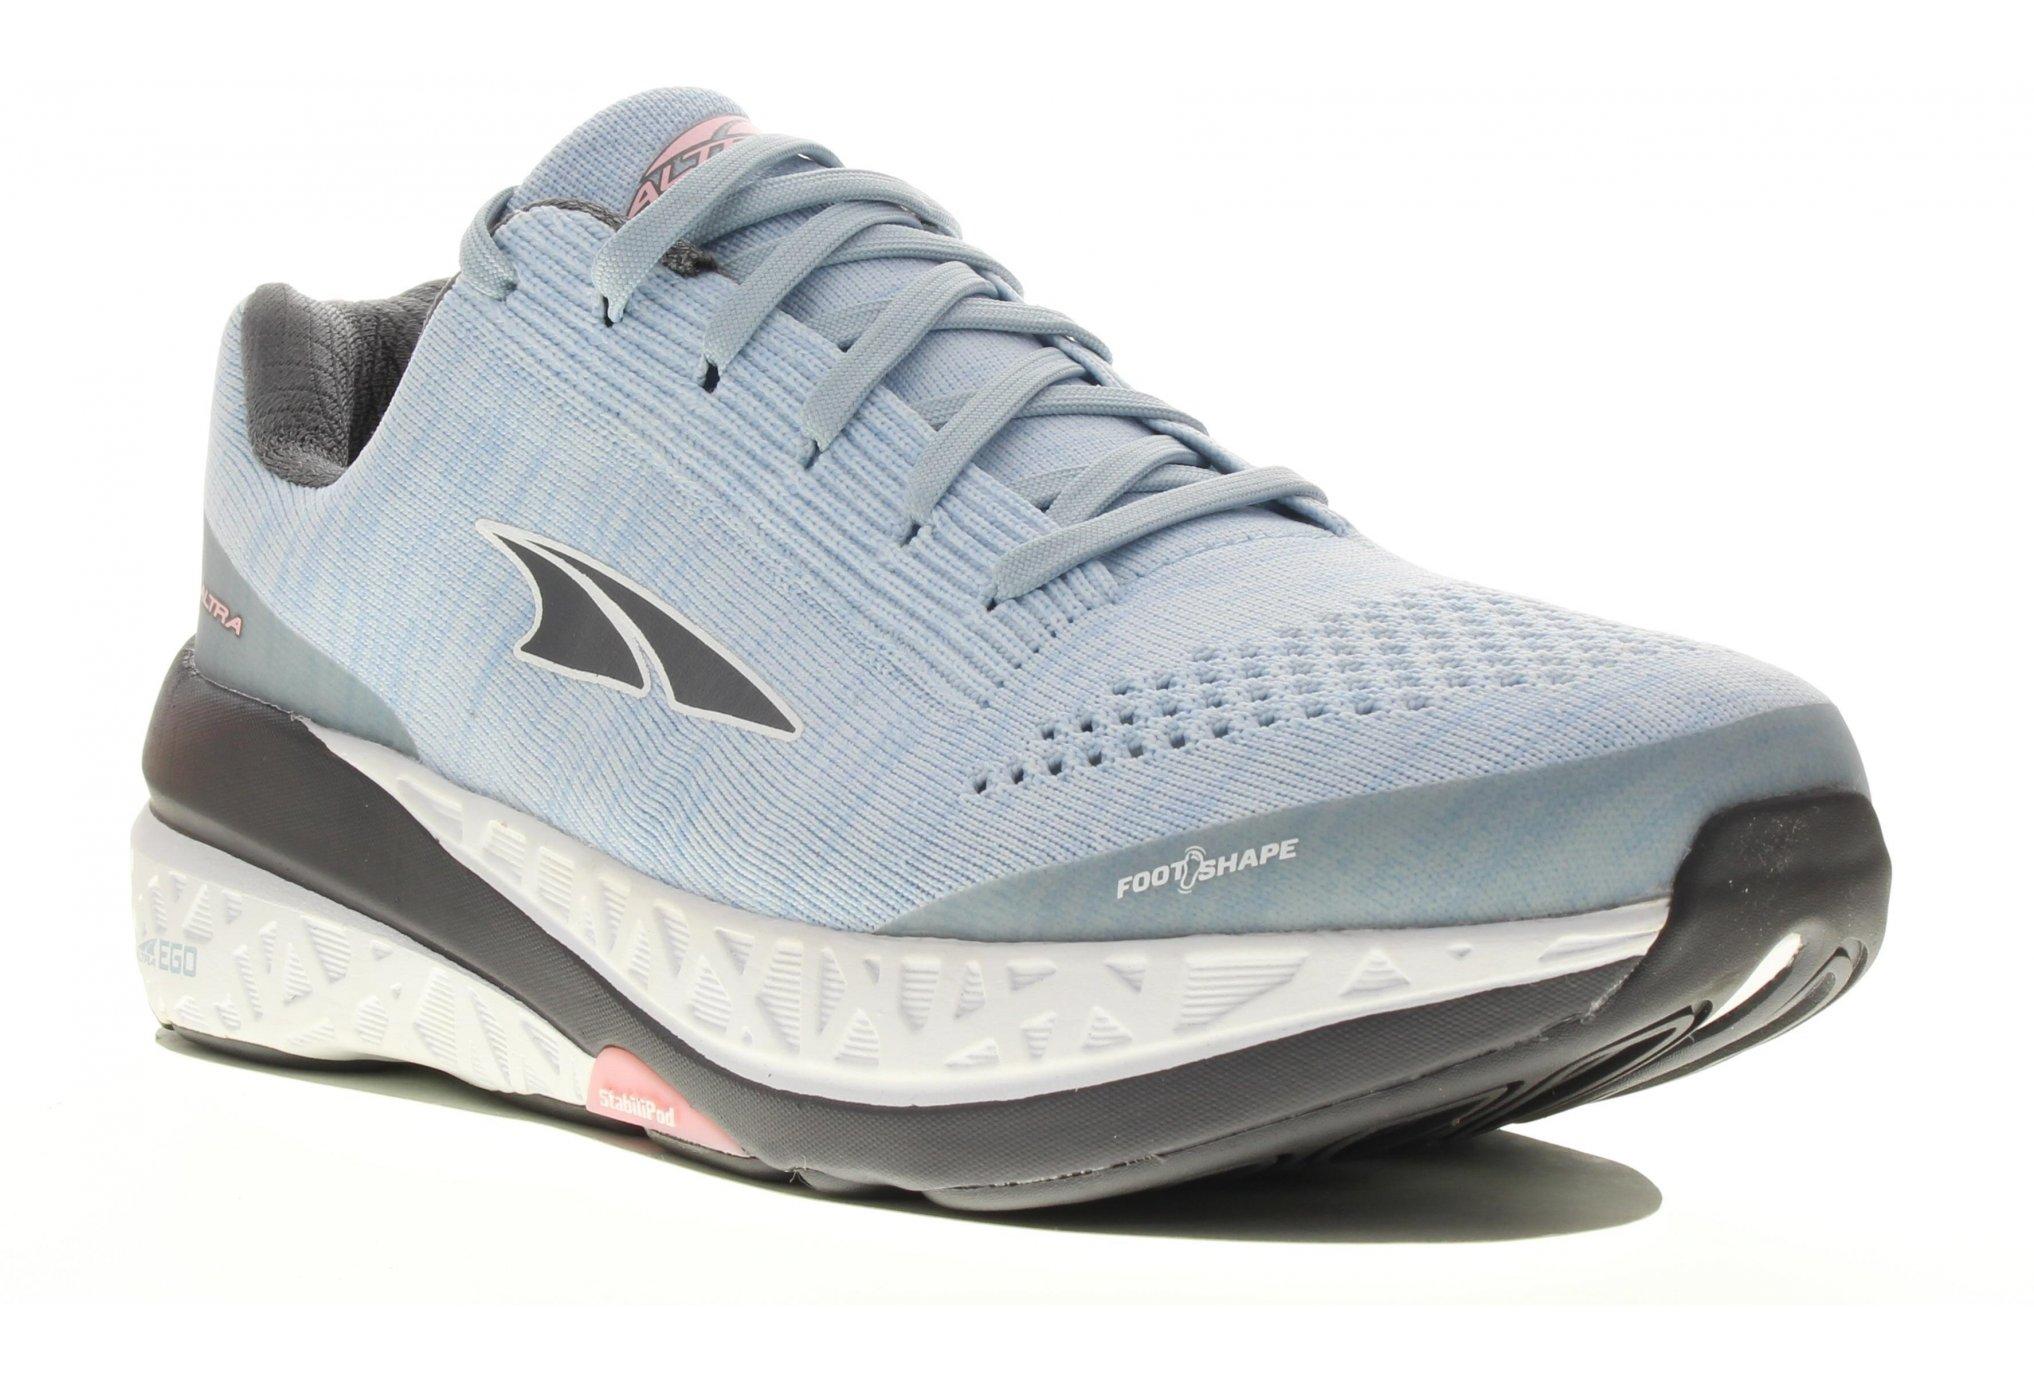 Altra Paradigm 4.5 Chaussures running femme